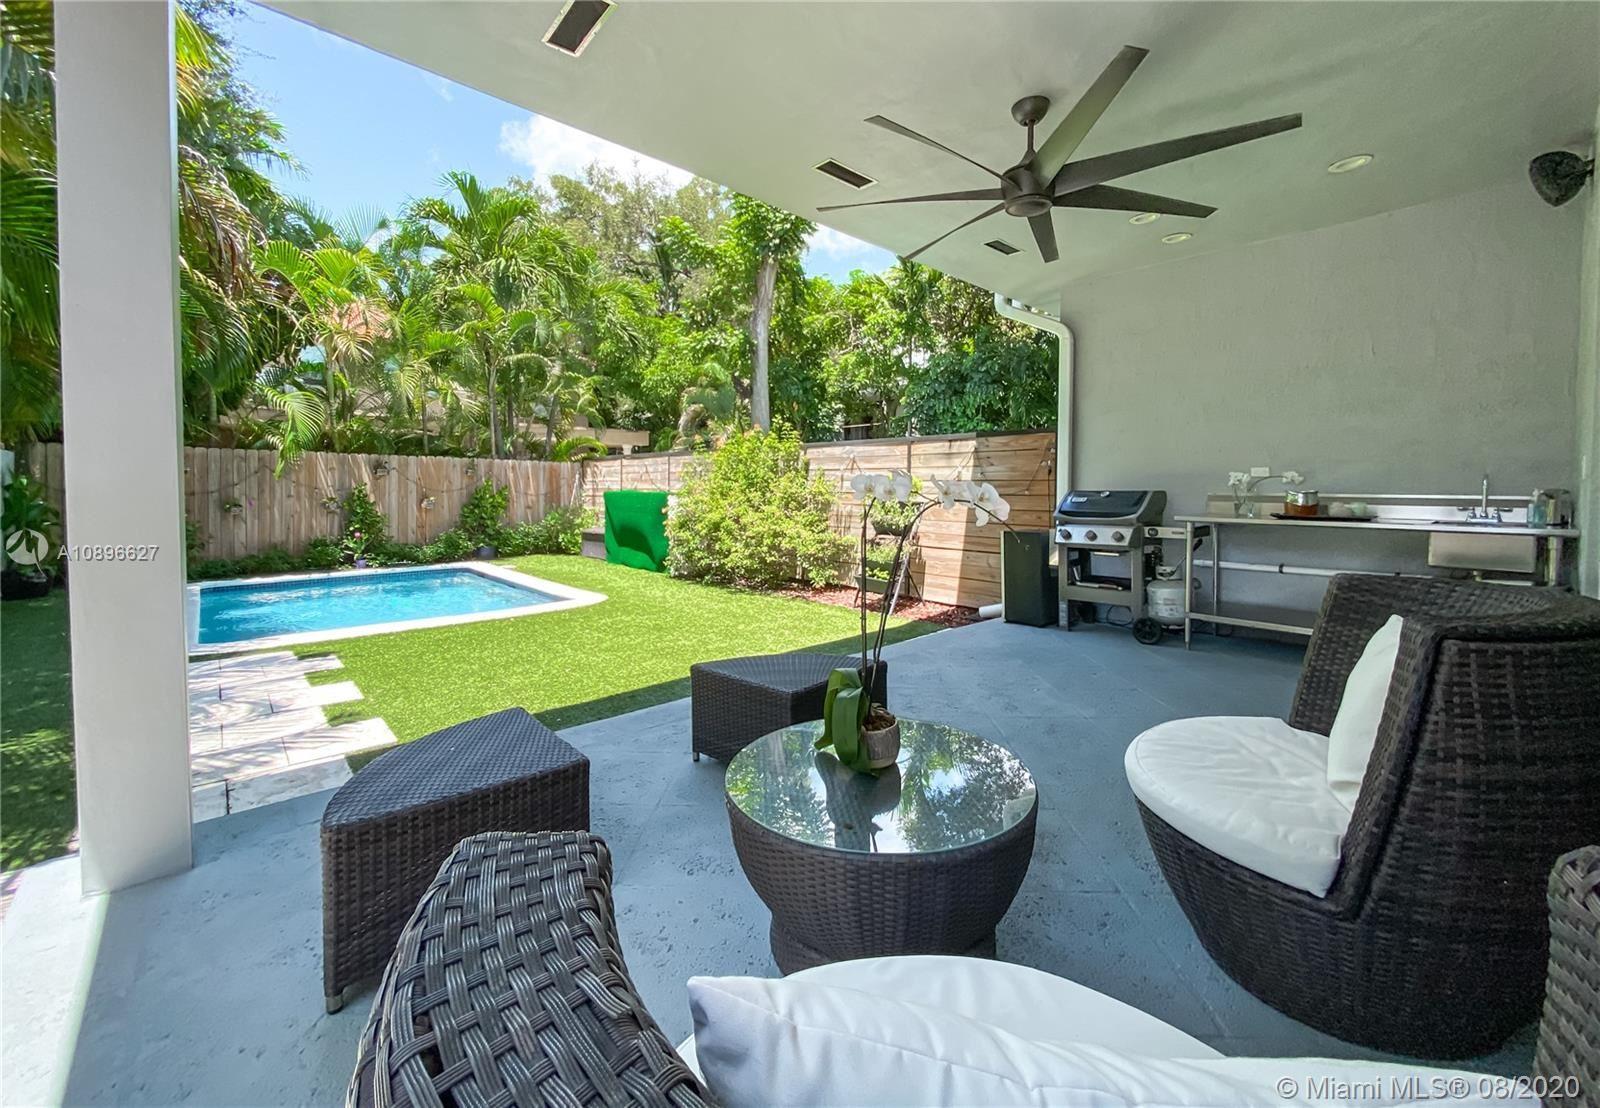 3032 Virginia St #3032, Miami, FL 33133 - #: A10896627